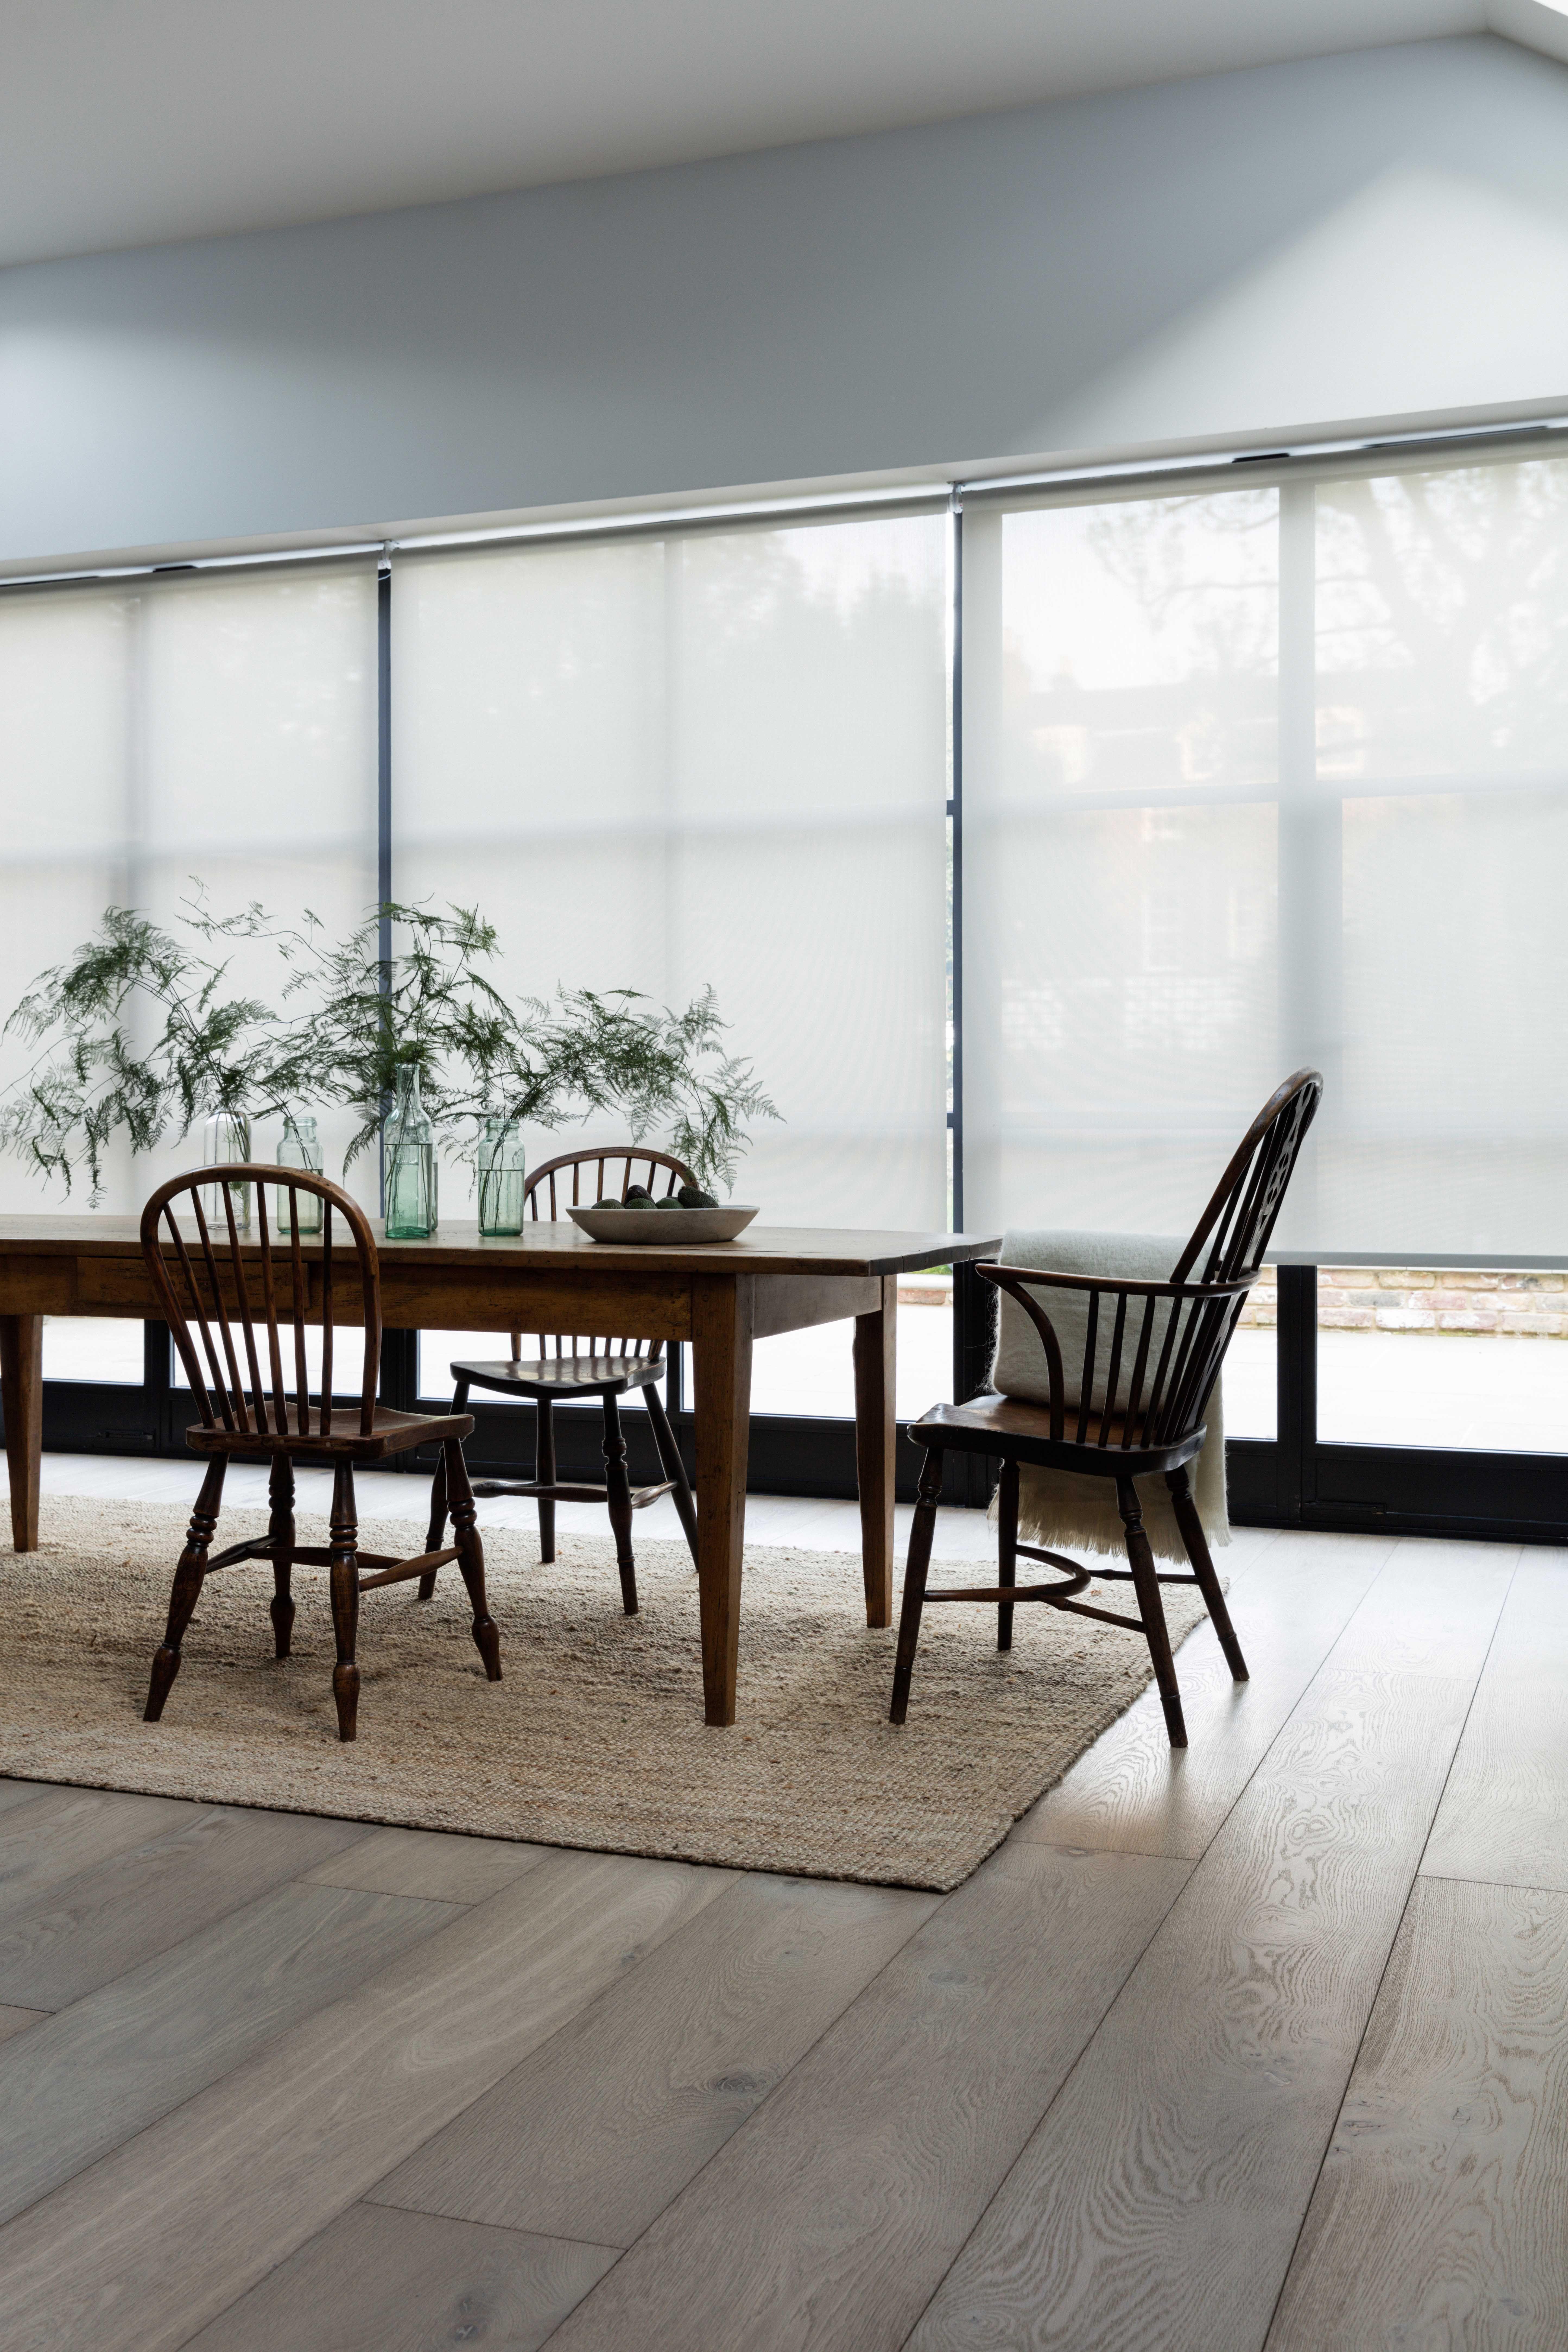 Barnes Trunk Floor Flooring, Home decor, Home